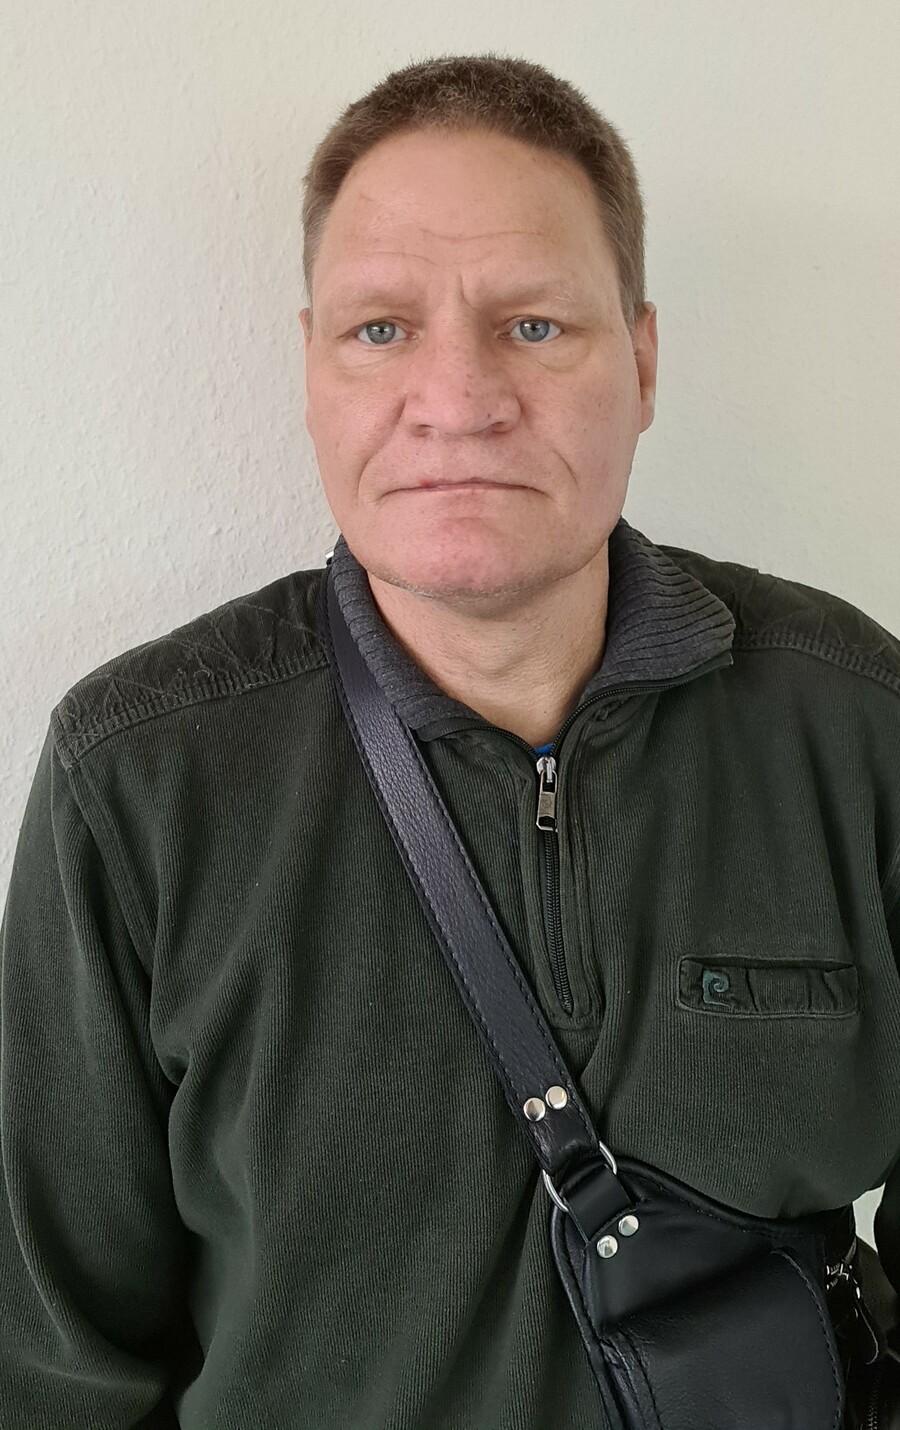 Michael Damkoehler